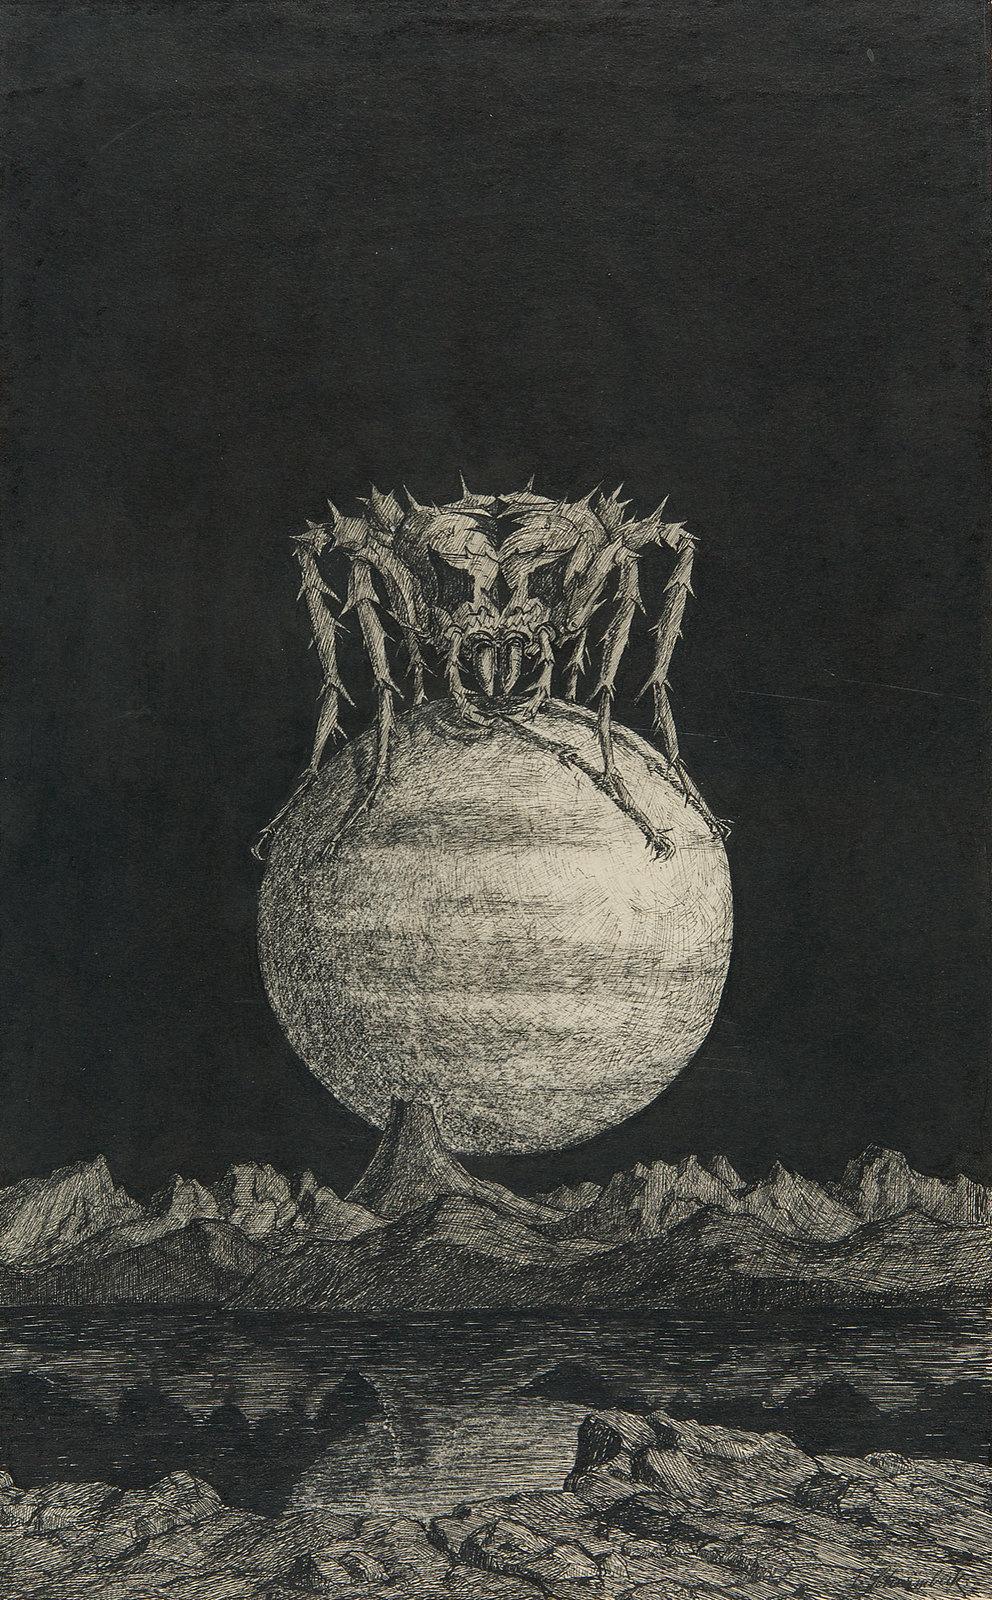 Fritz Schwimbeck - Eternity, 1910